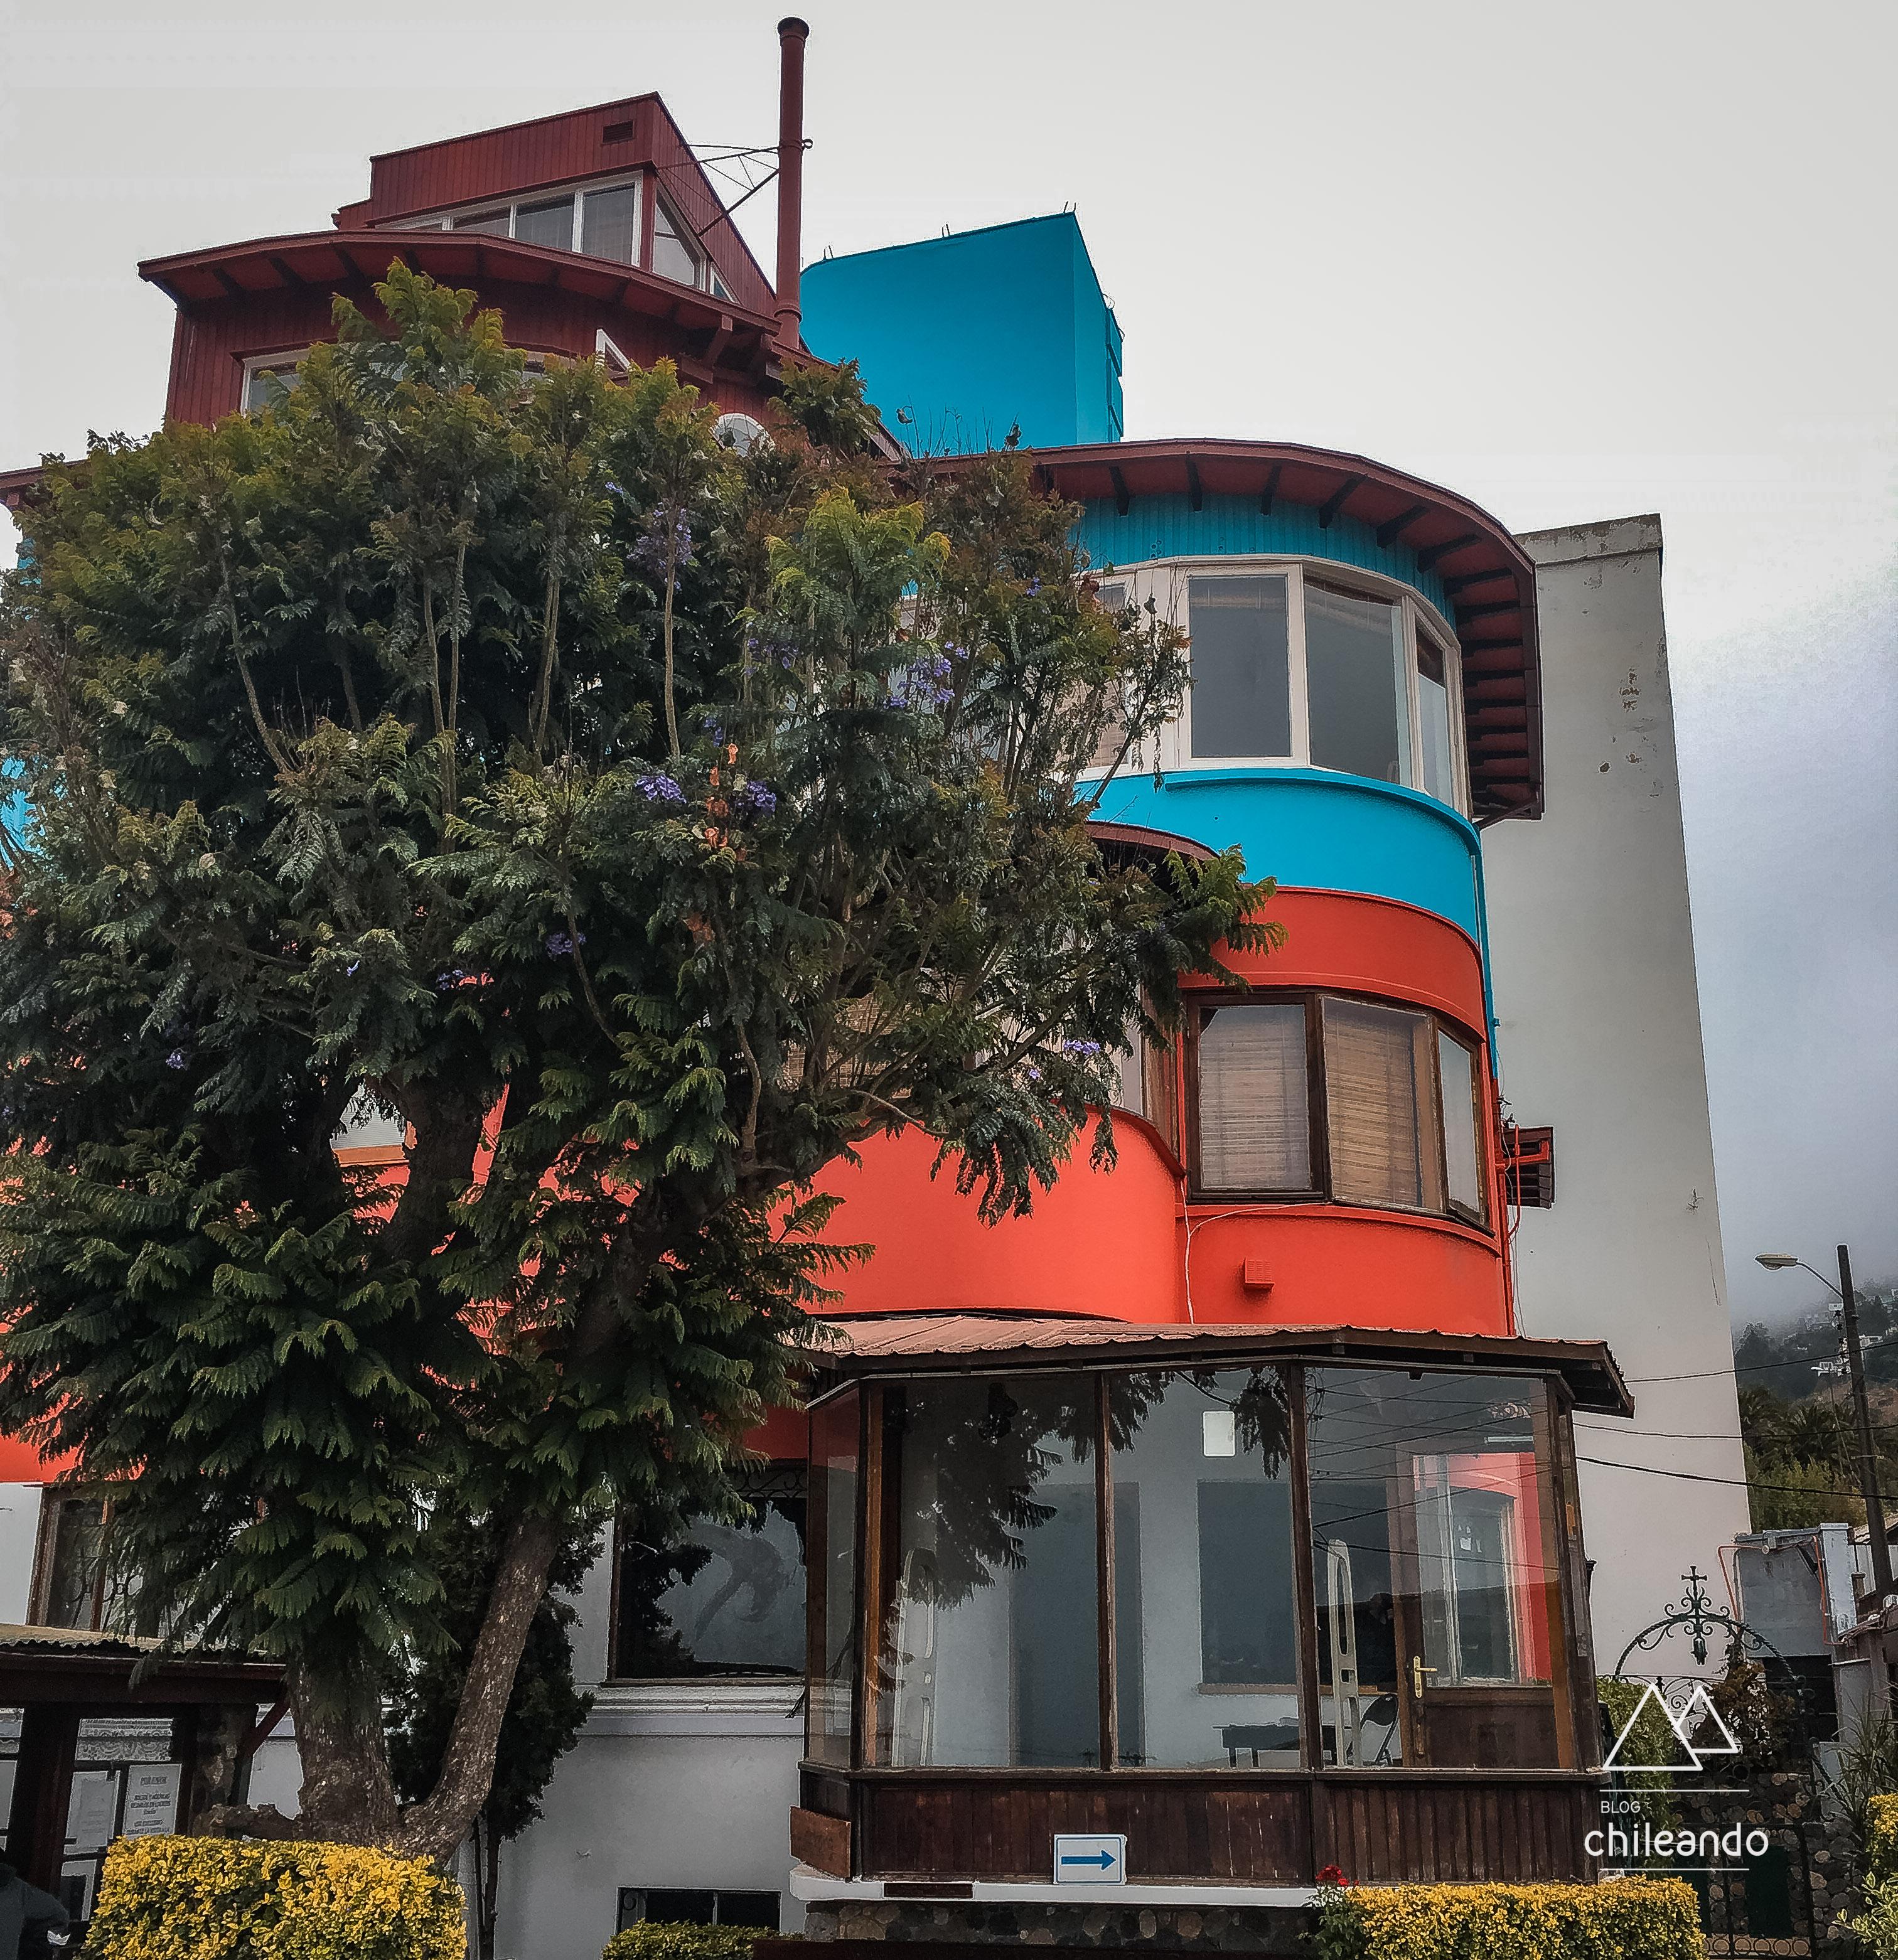 Casa museu de Neruda, La Sebastiana